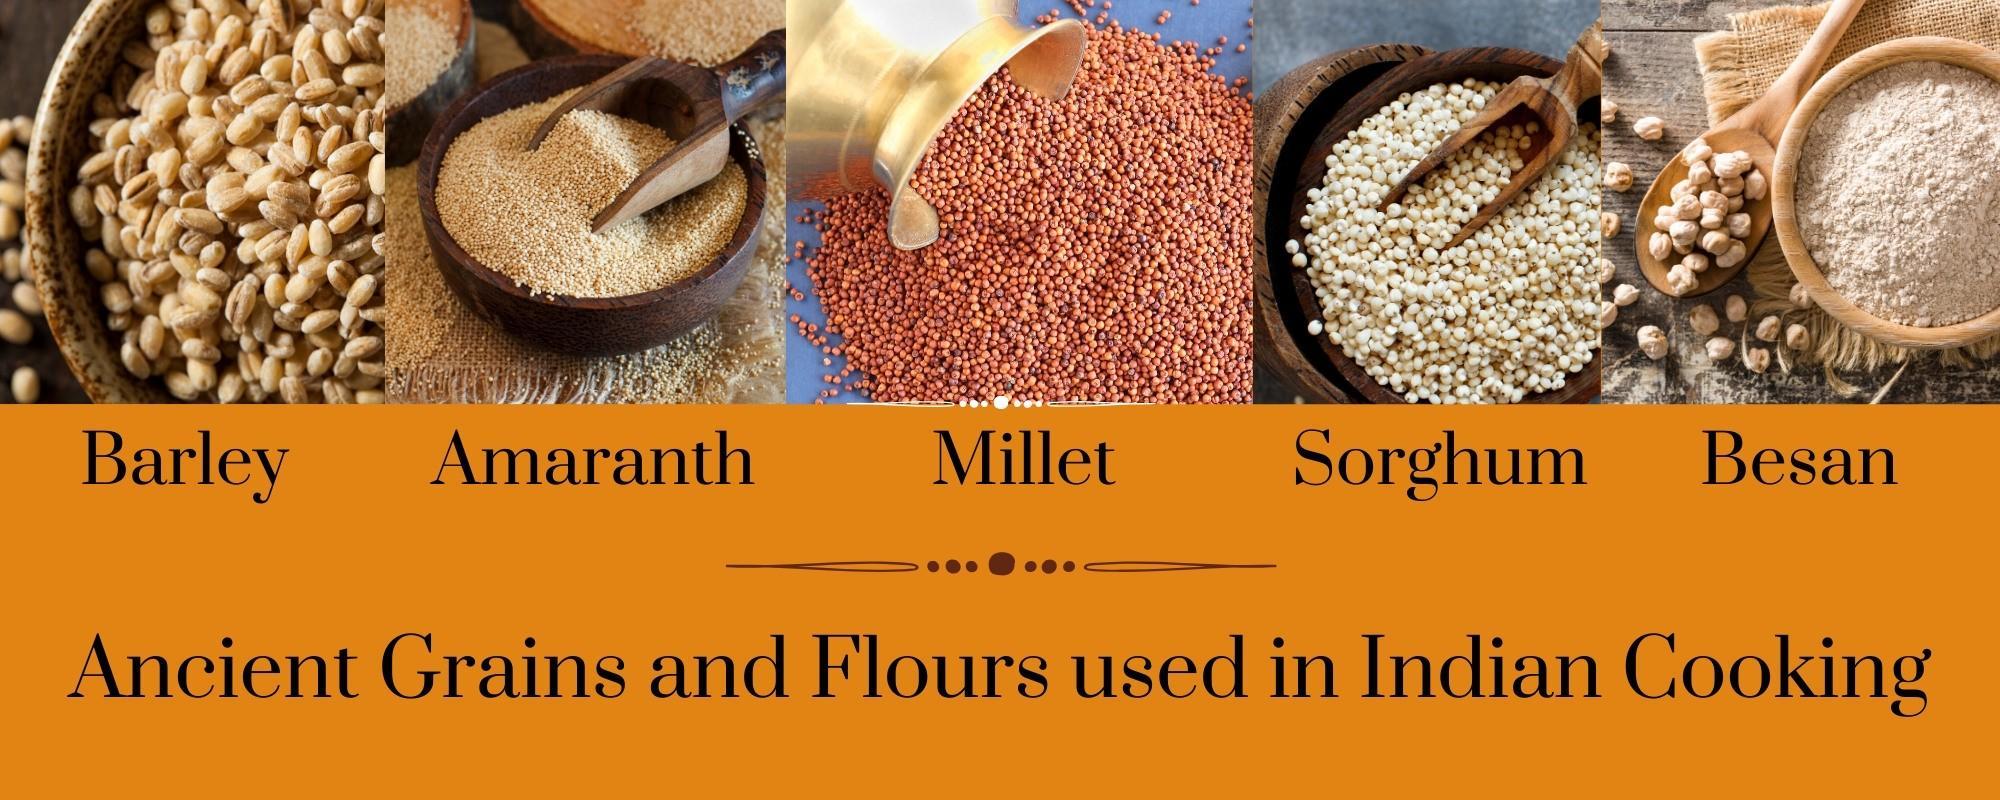 Vegan Indian Recipe Grains Barley, Amaranth, Millet, Sorghum, Besan: Ancient Grains and Flours used in Indian Cooking